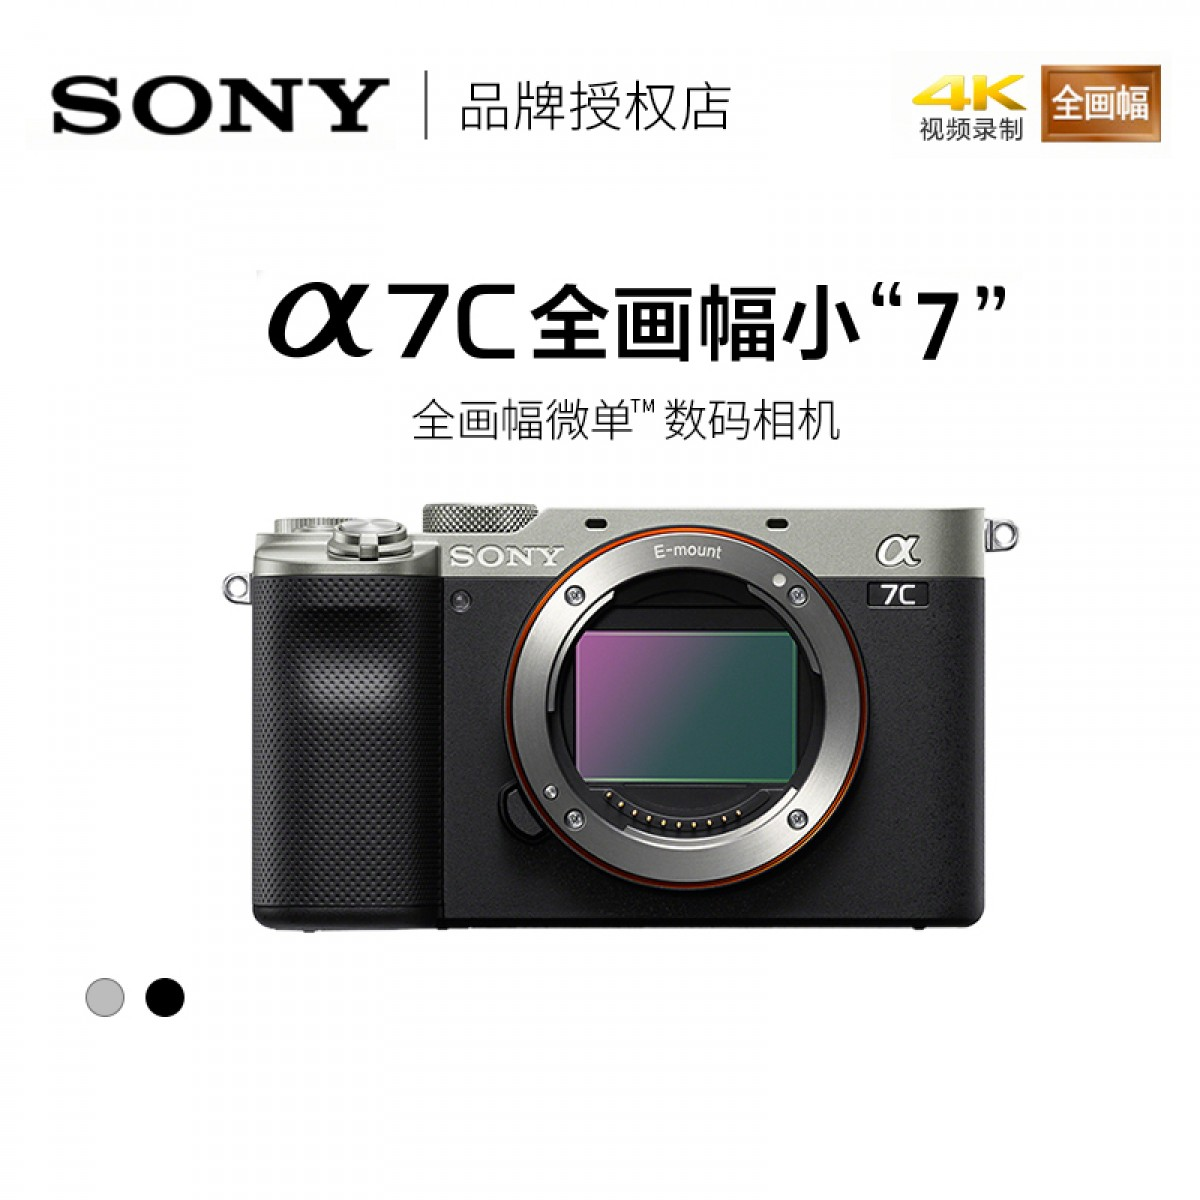 Sony/索尼Alpha 7C 索尼A7C全画幅微单4K高清Vlog数码相机ILCE-7C